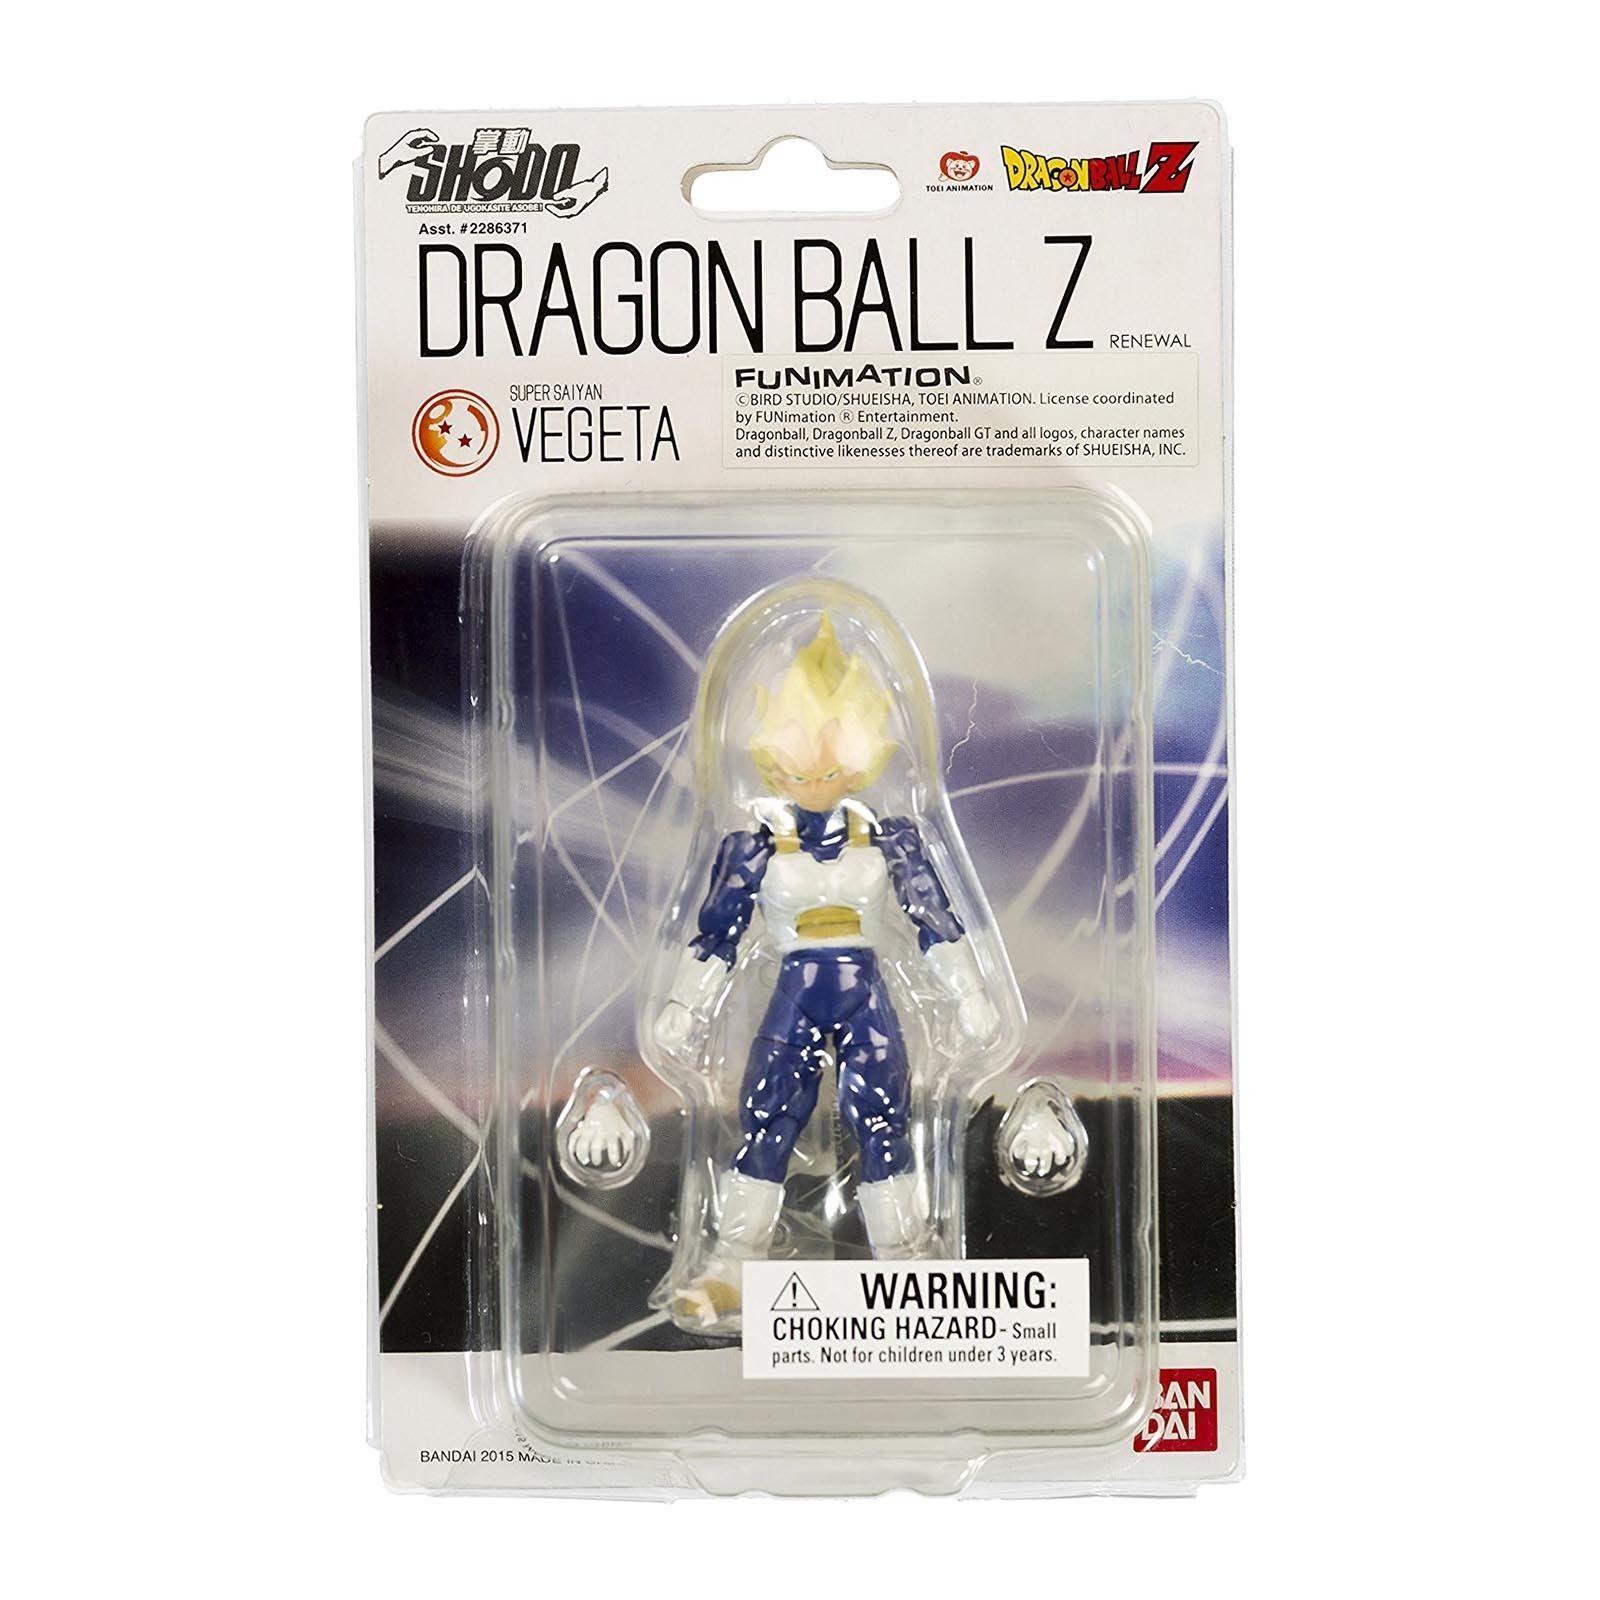 Bandai Shodo Renewal Dragon Ball Z Action Figure DBZ  Super Saiyan Vegeta